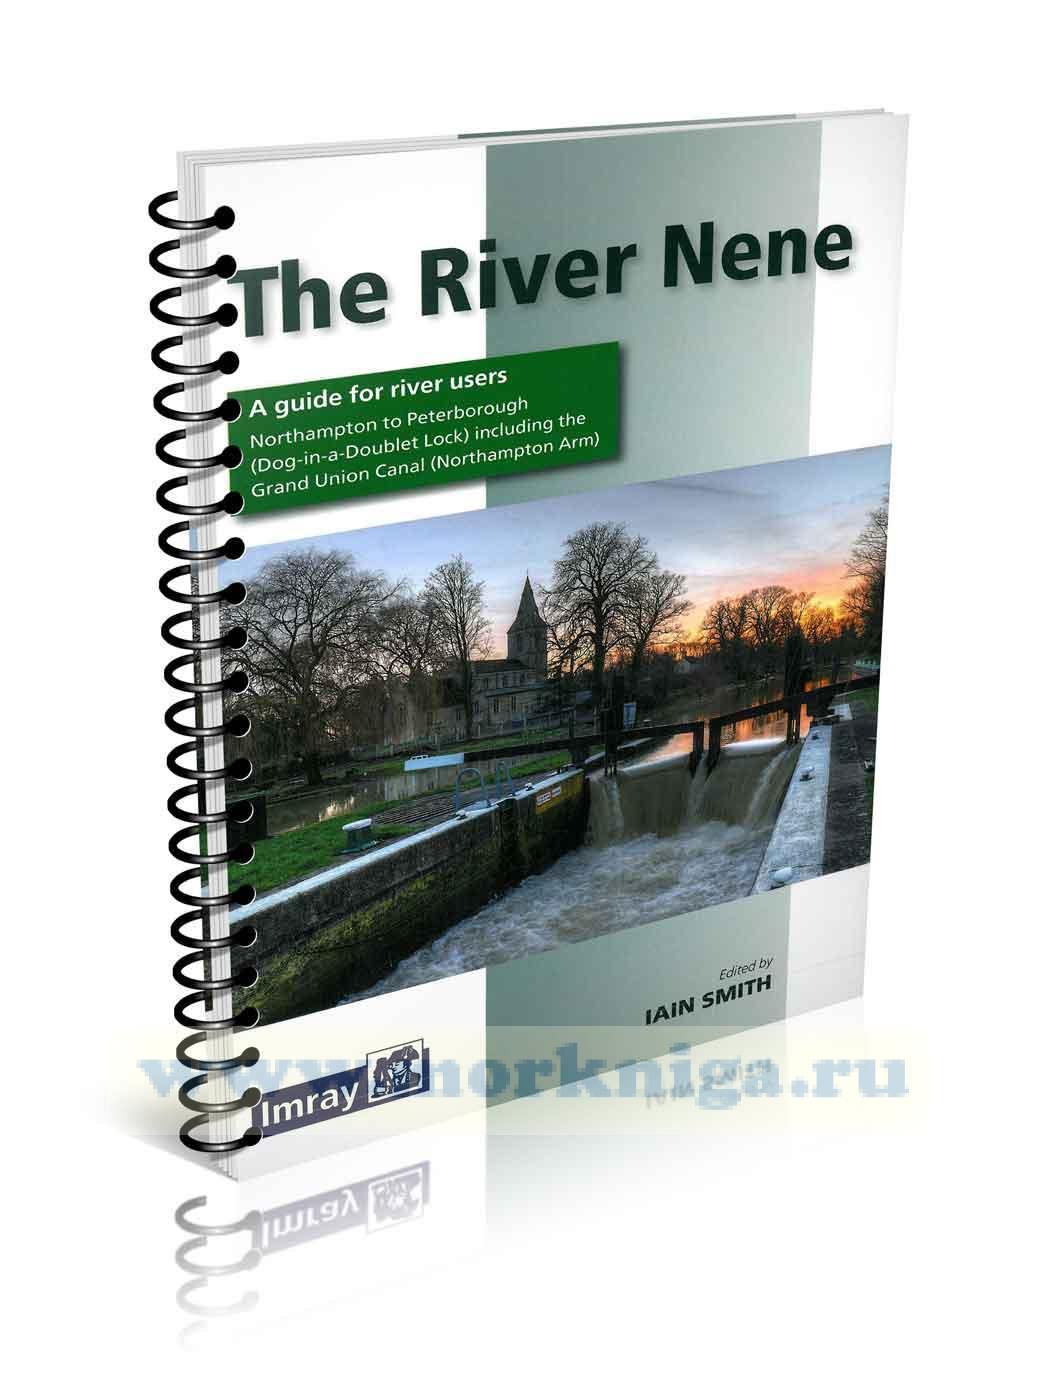 The River Nene. Река Нин. Руководство для судоводителей